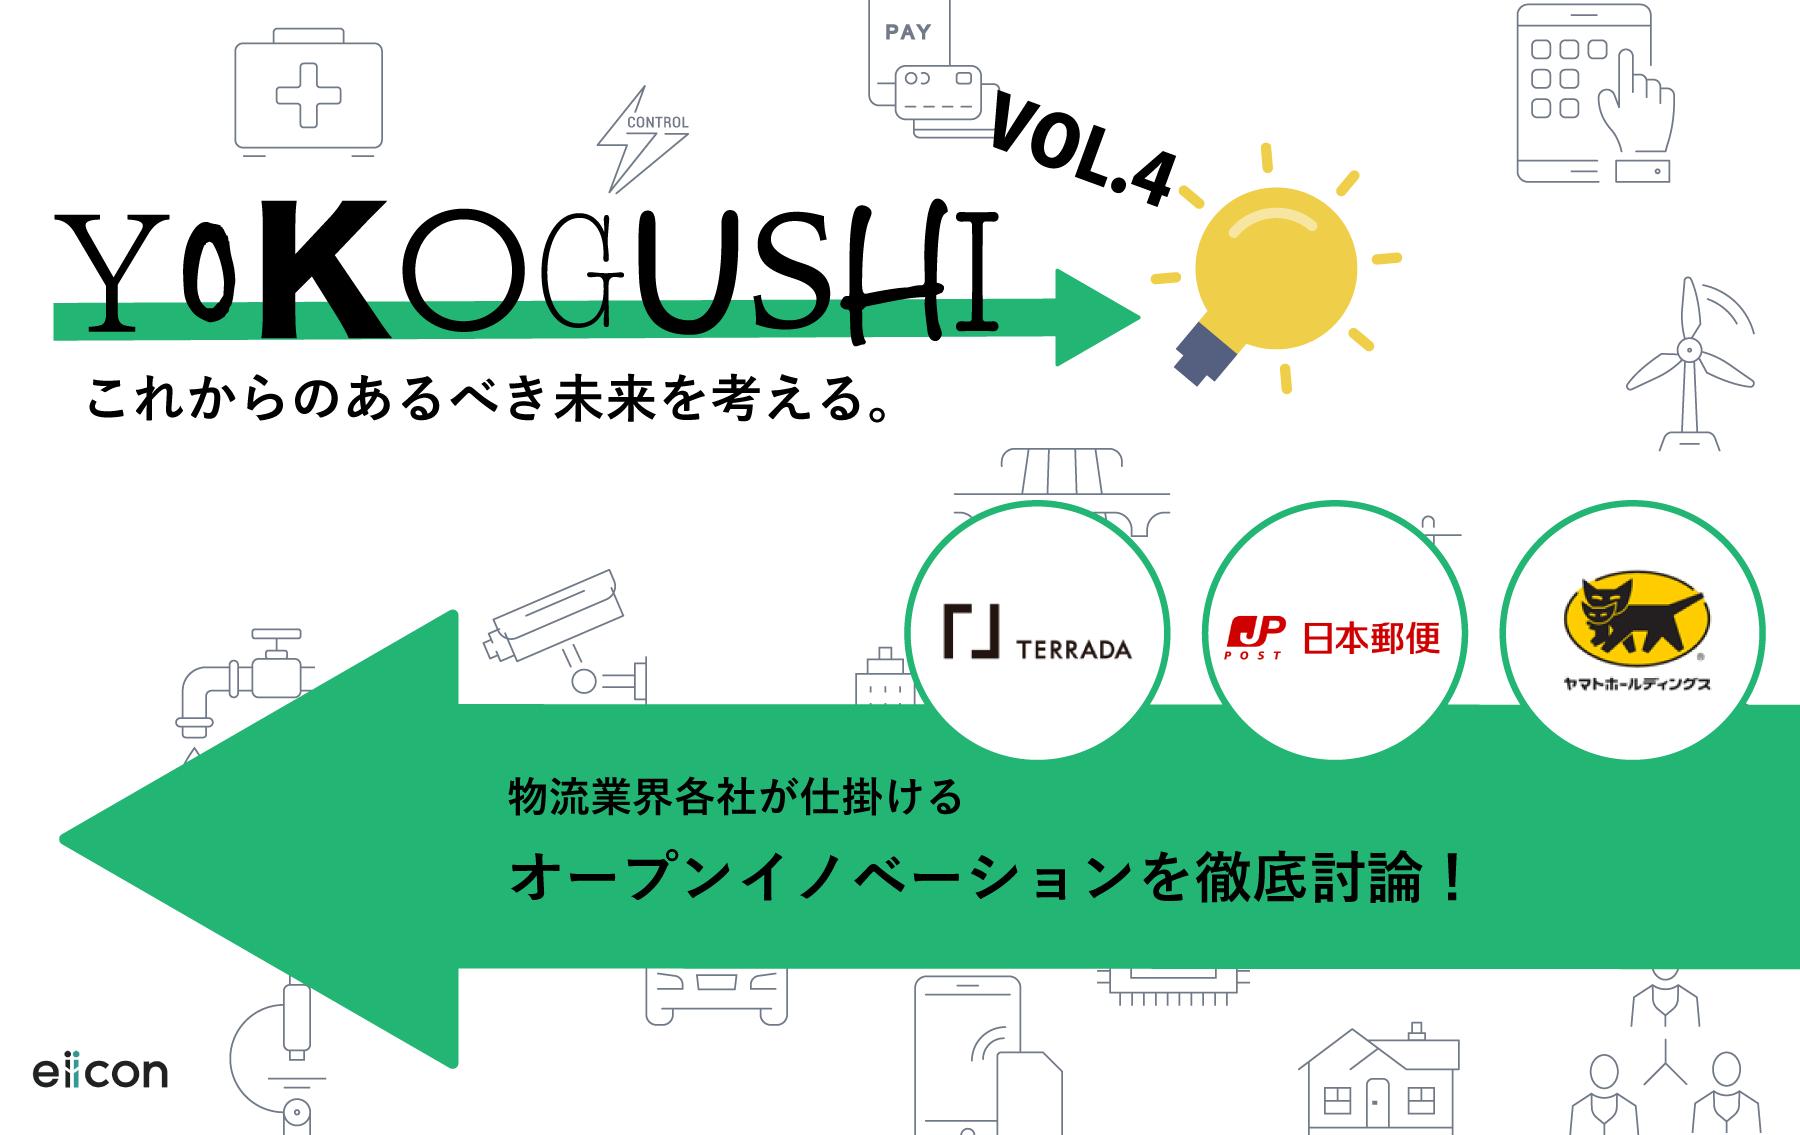 〜YOKOGUSHI VOL.4 ~物流業界 各社が仕掛けるオープンイノベーションを徹底討論!~